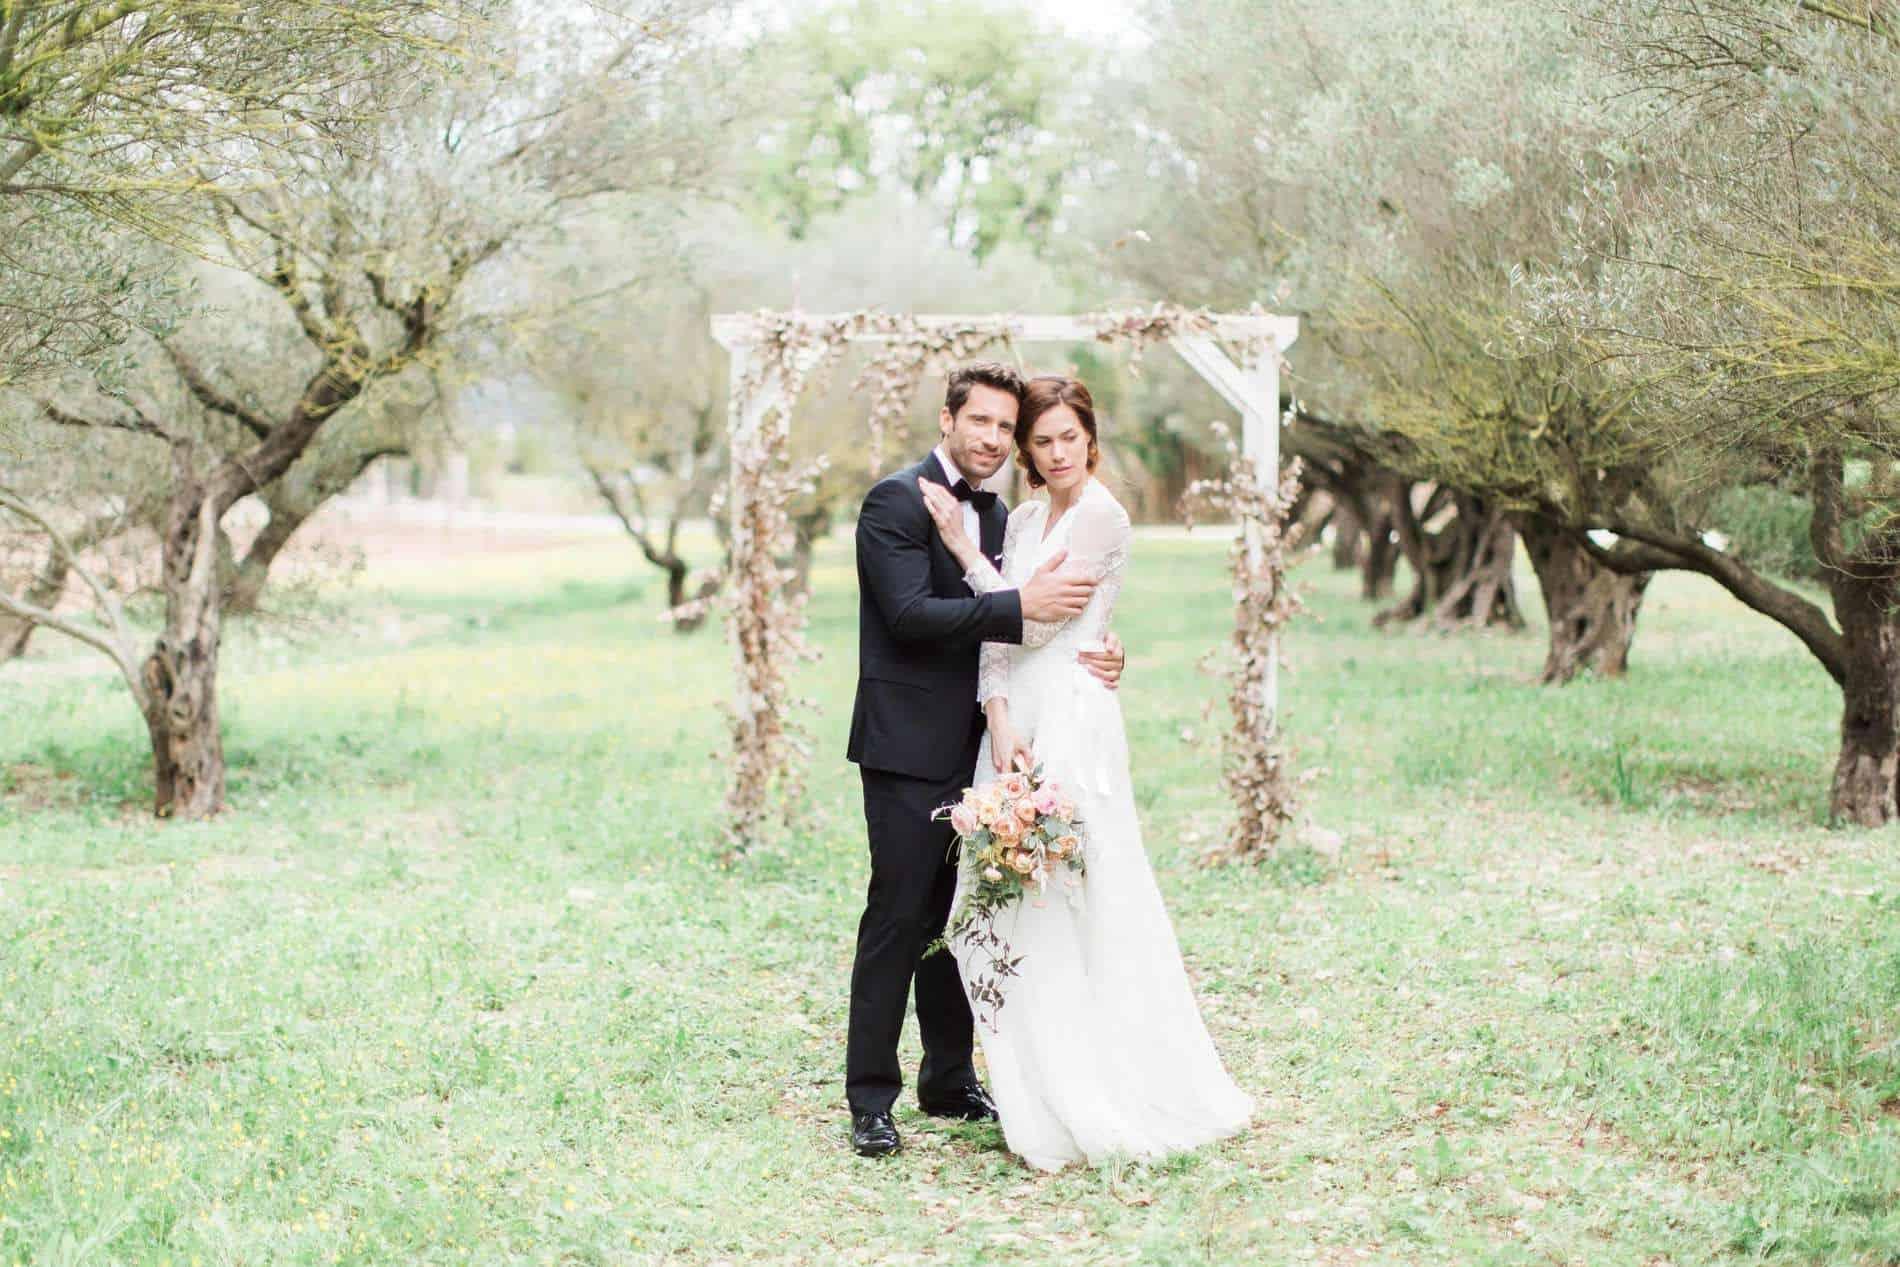 wedding photographer / FineArt / Paris / photographe mariage / destination wedding photographer